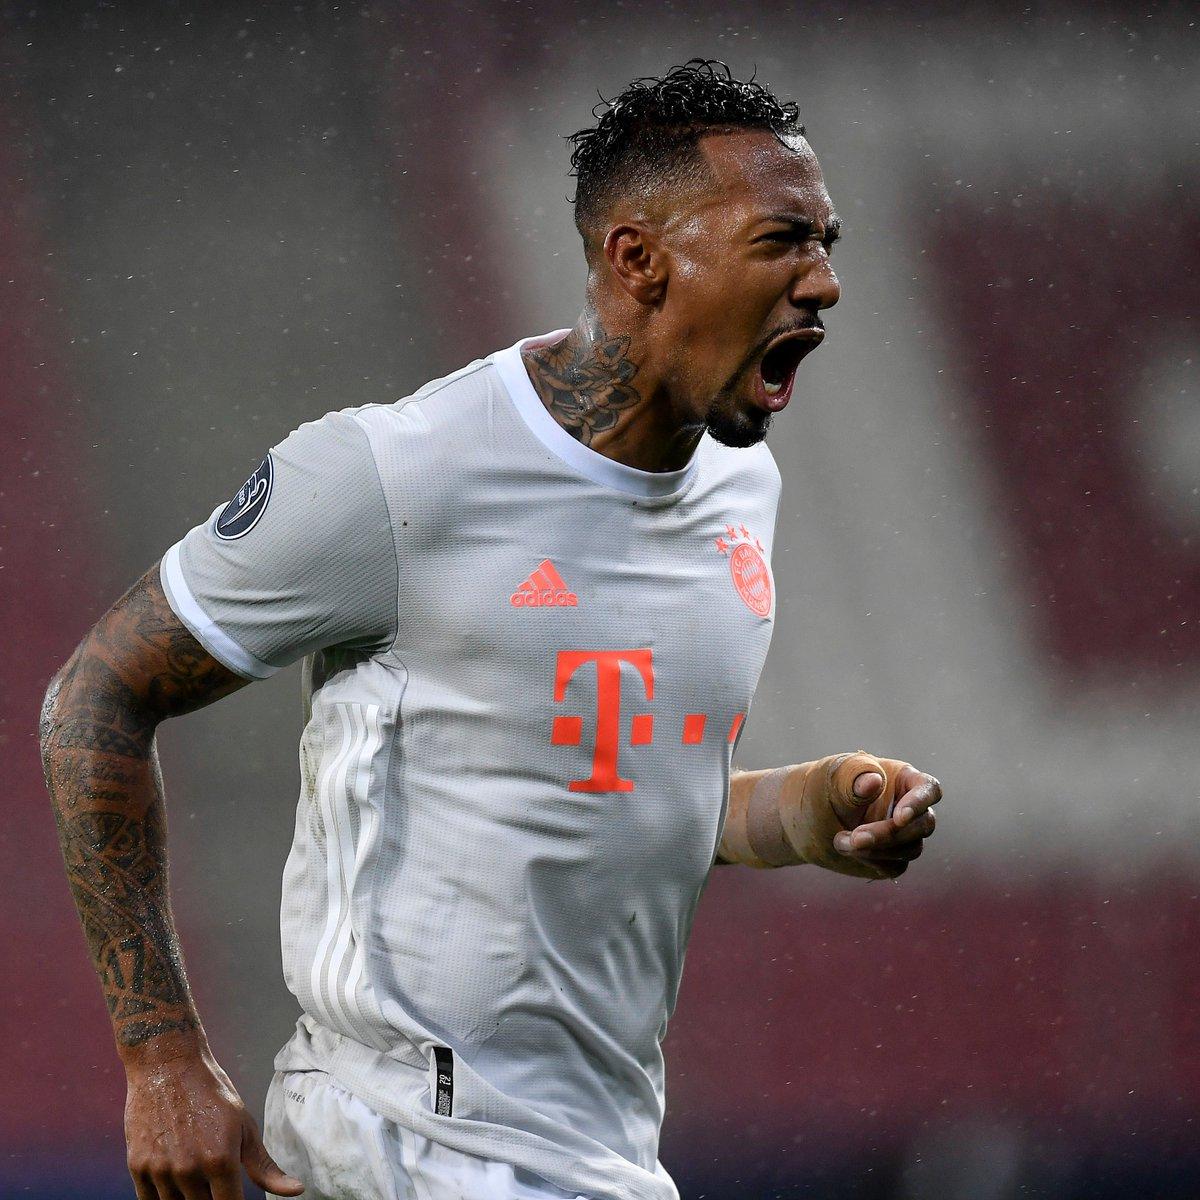 Yesssssaa 🔥 Good win boys @FCBayern @ChampionsLeague